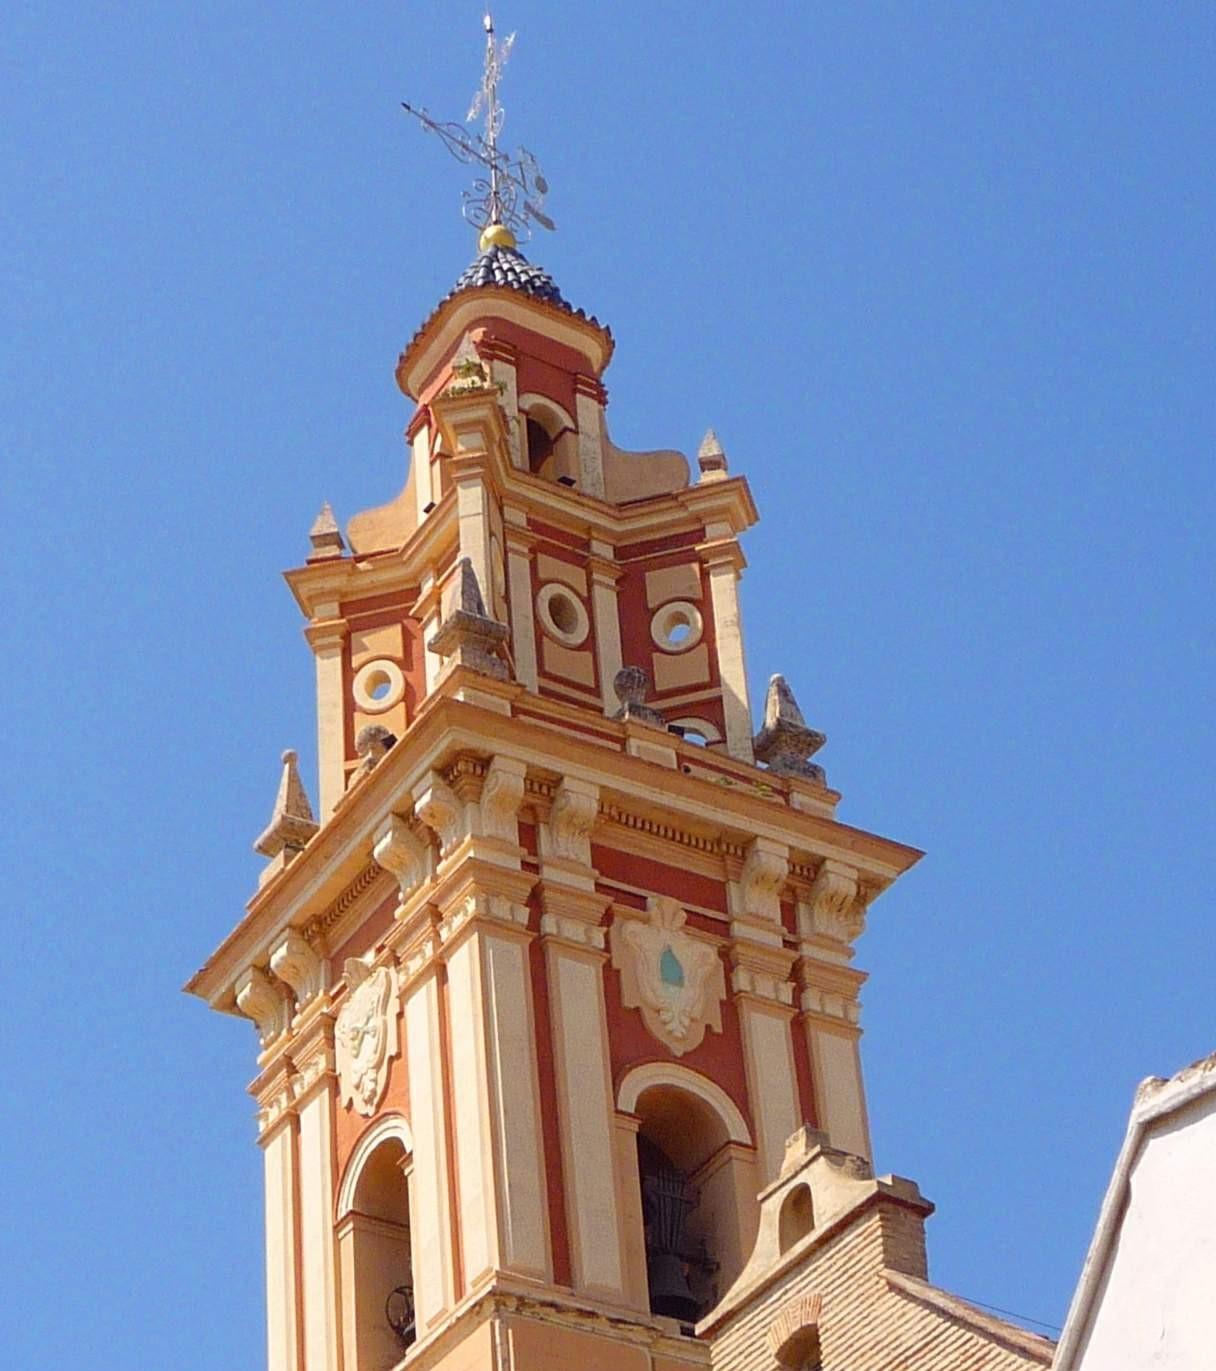 Esglesia de Sant Miquel de Catarroja